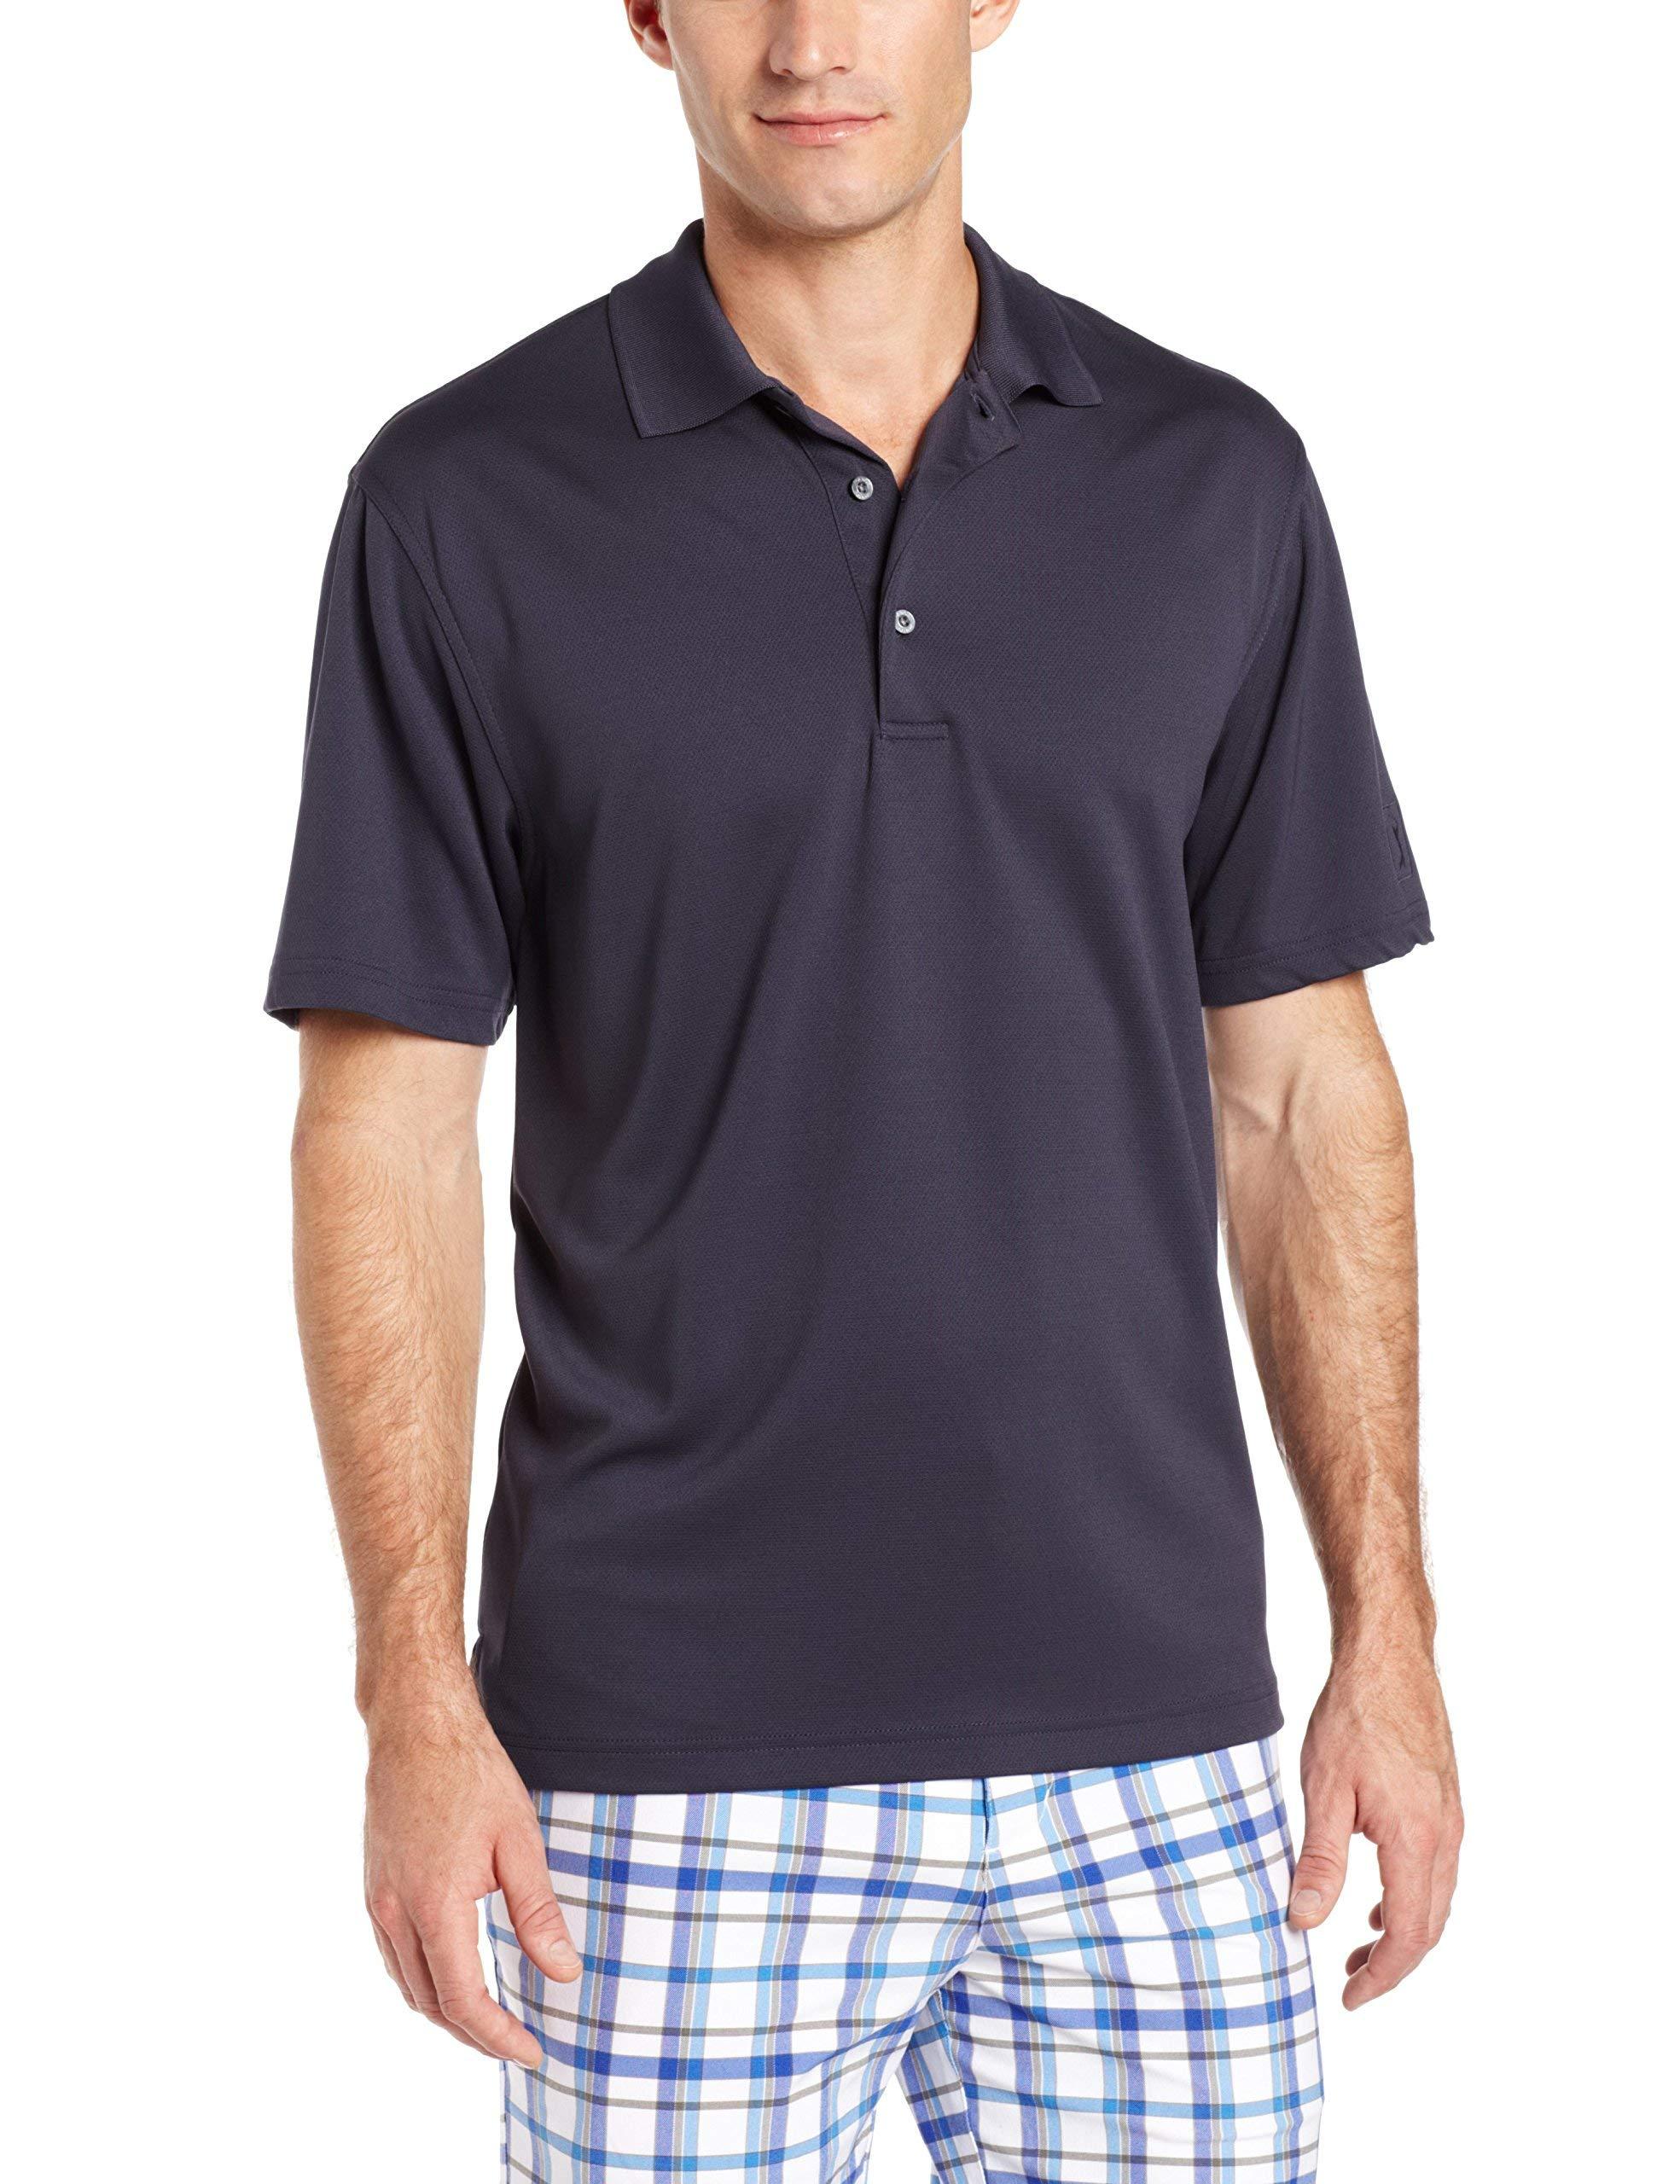 PGA TOUR Men's Short Sleeve Airflux Solid Polo Shirt, Graphite, S